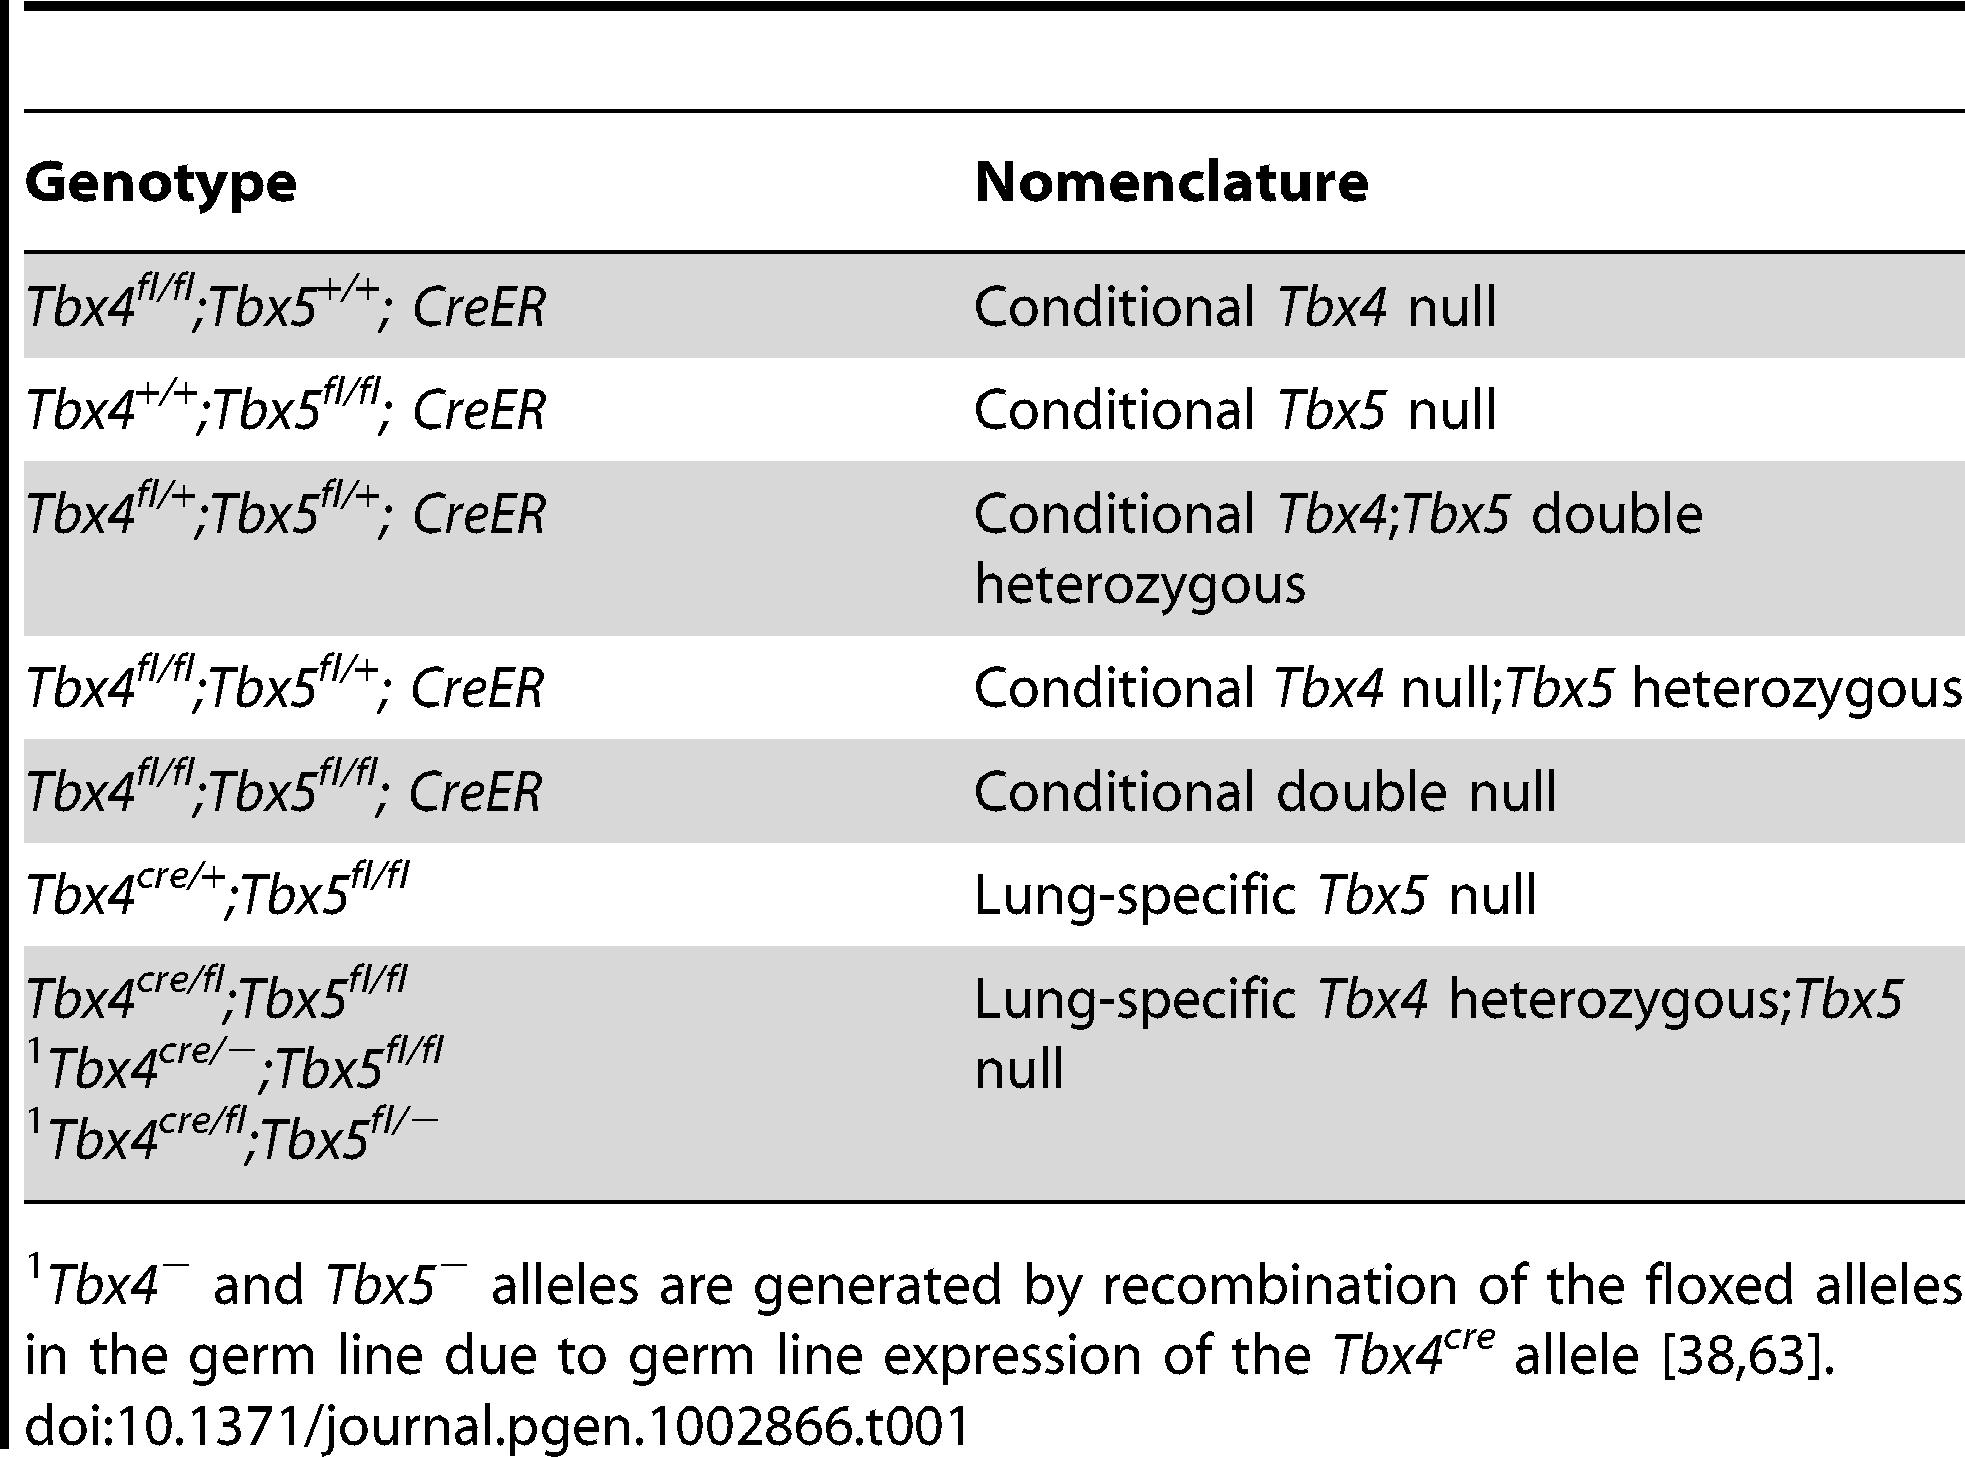 Different allelic combinations and the descriptive nomenclature.